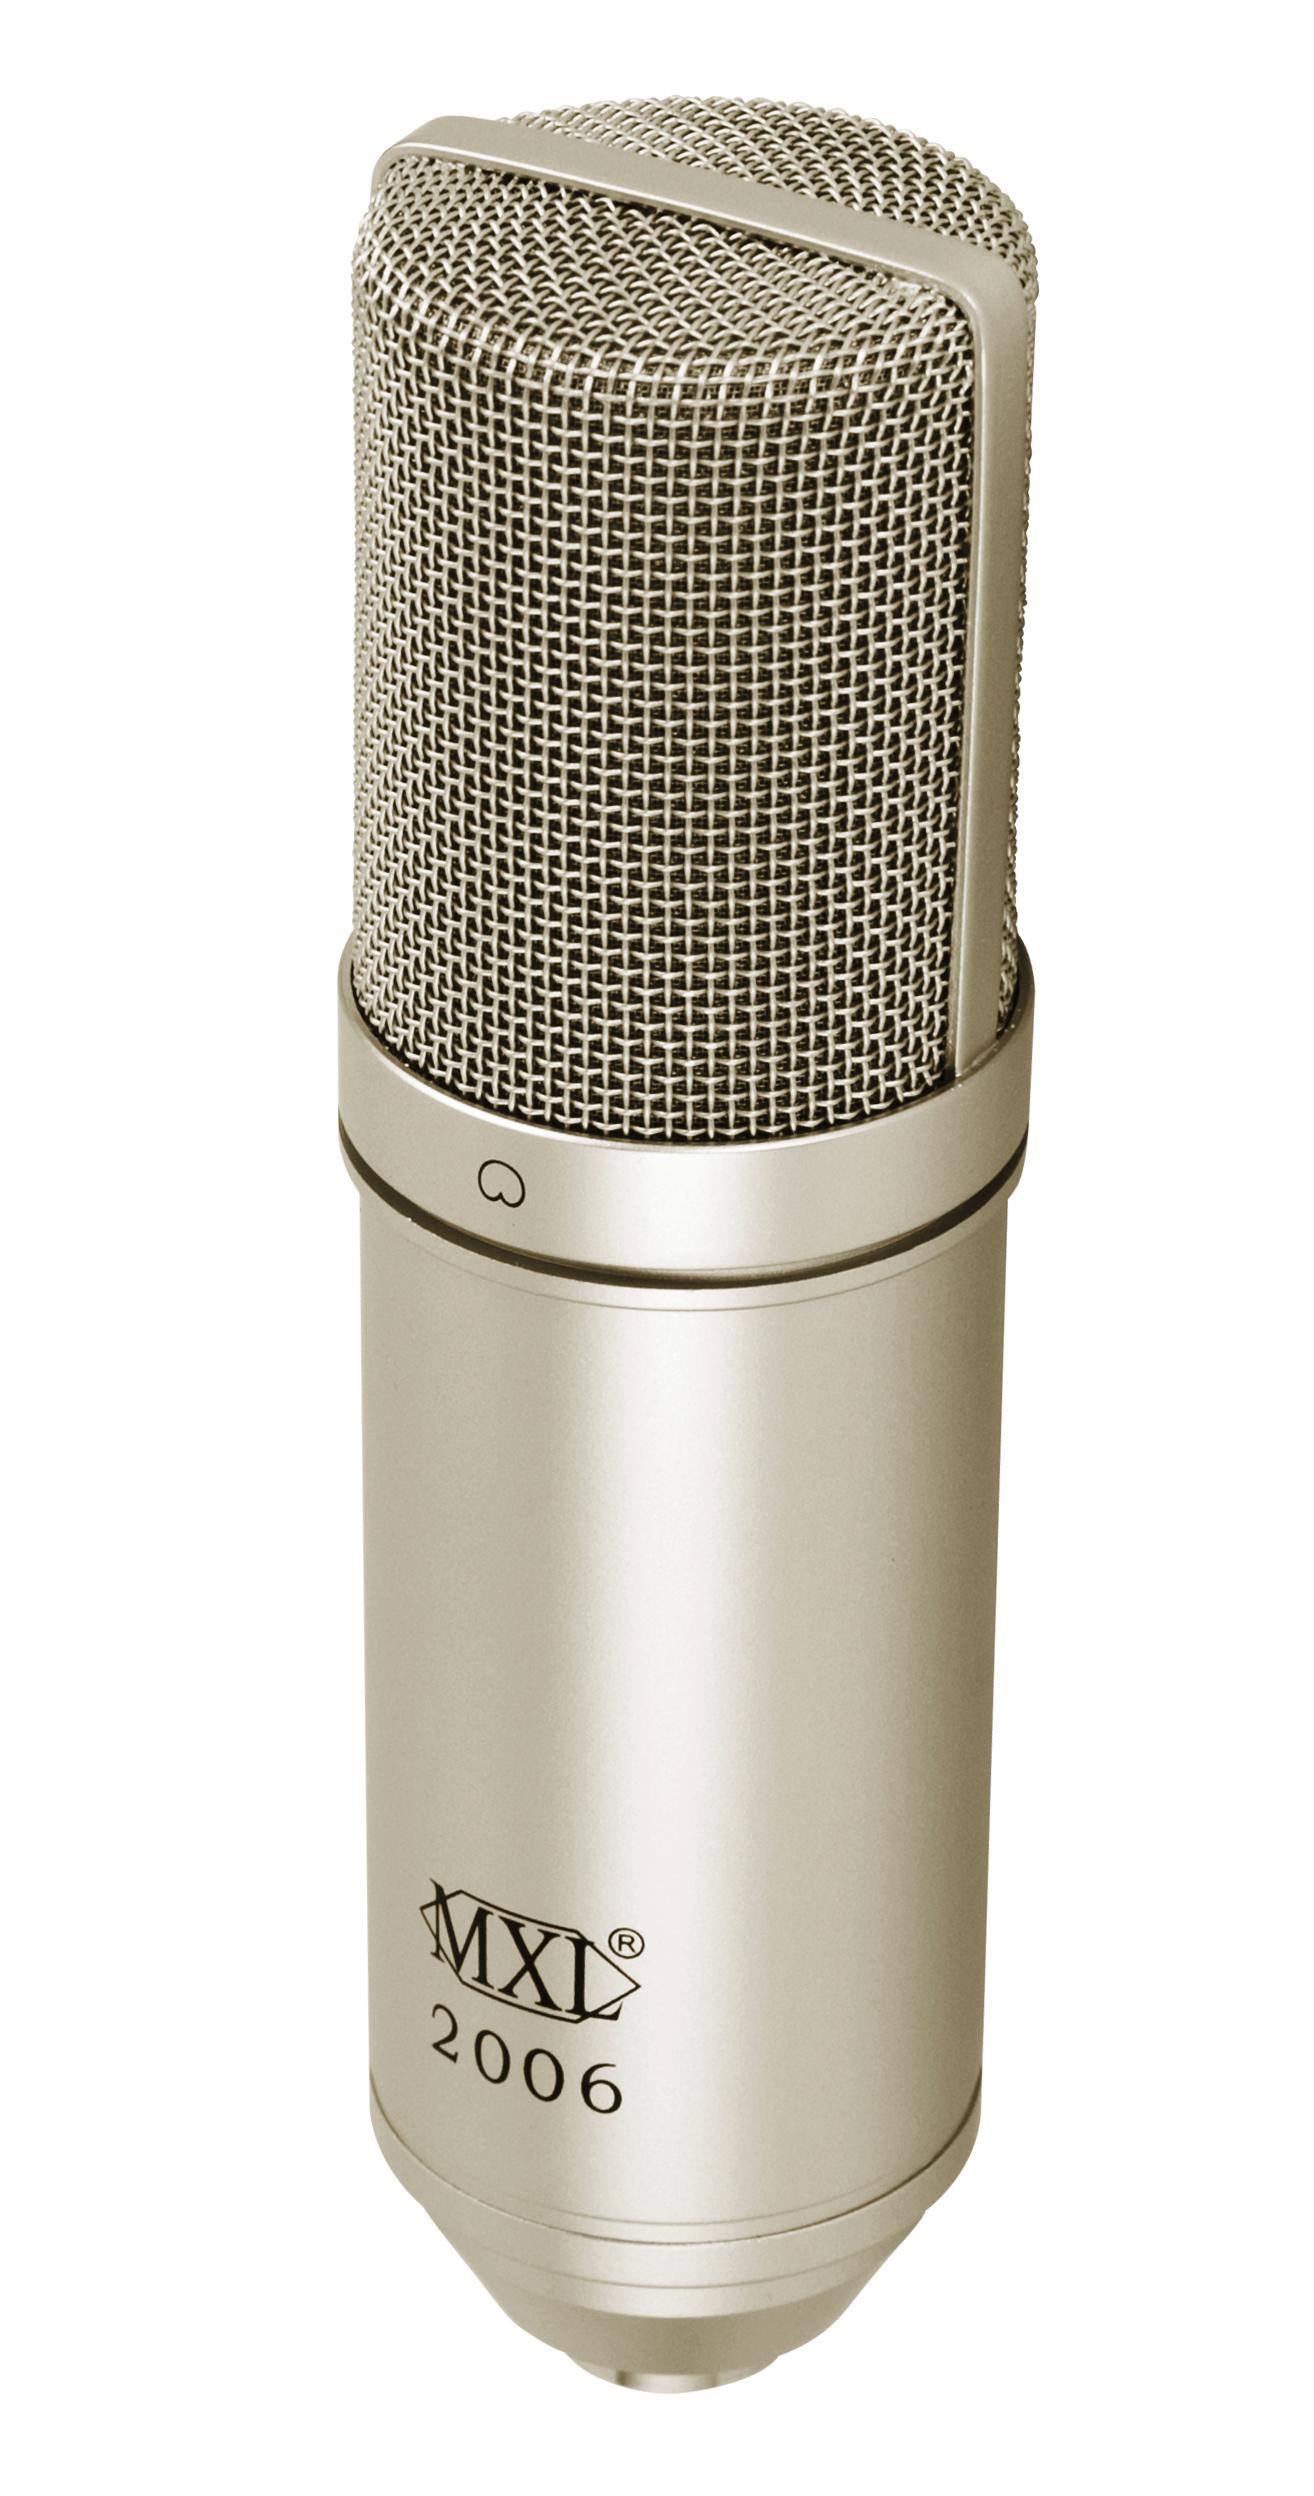 mxl 2006 microphone is it good mxl microphones. Black Bedroom Furniture Sets. Home Design Ideas